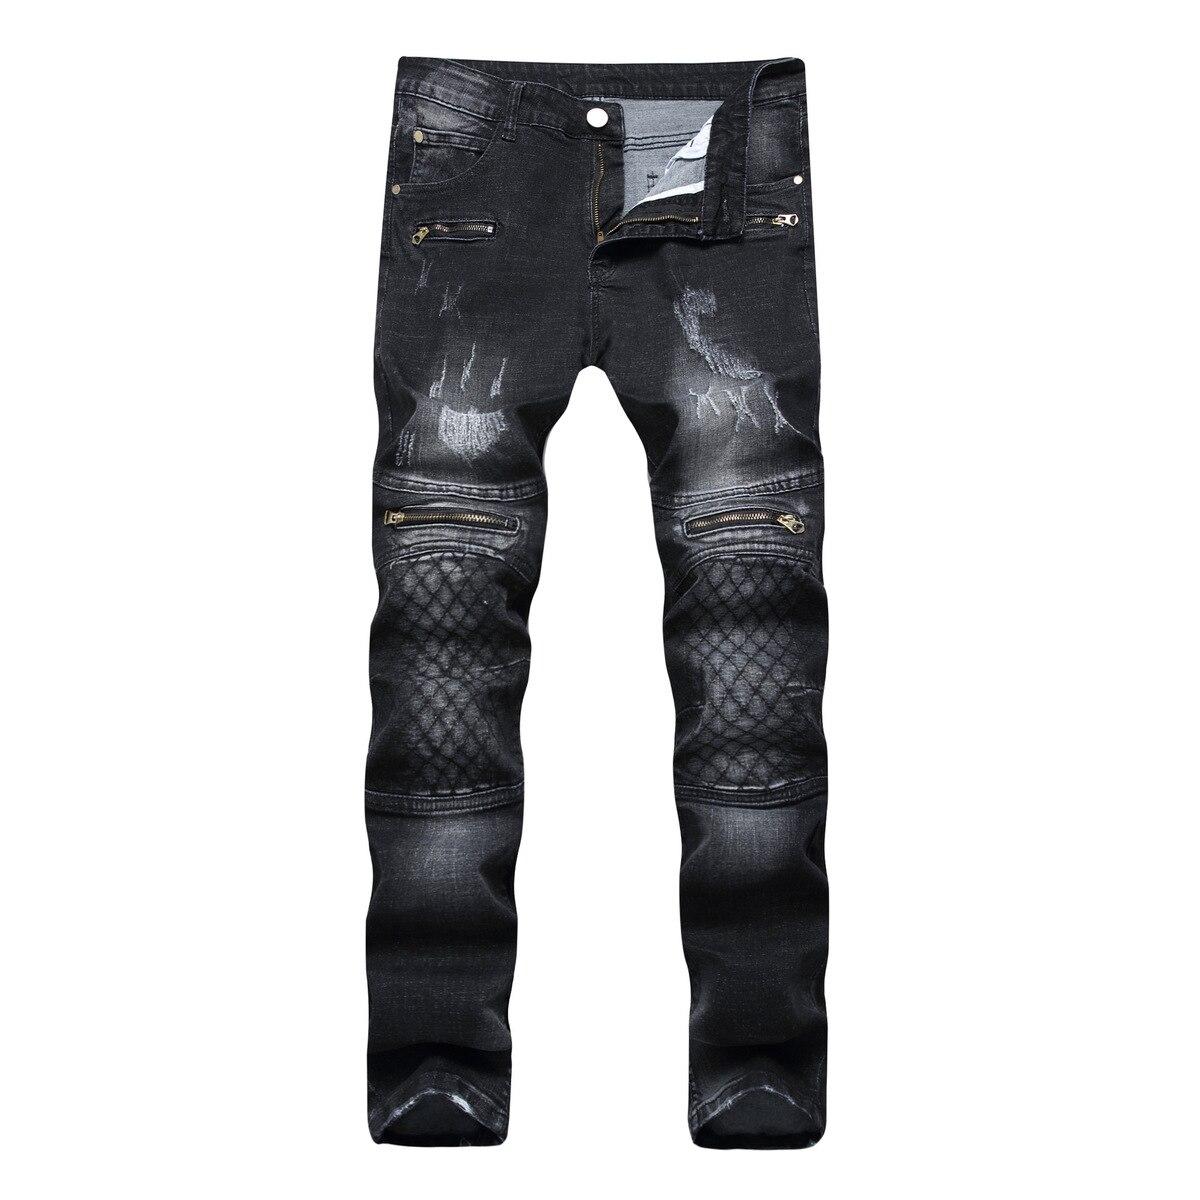 Man Black skinny straight Jeans Decoration Zipper Mens Elastic Force Pants homme street denim pantalon distressed jeans ripped